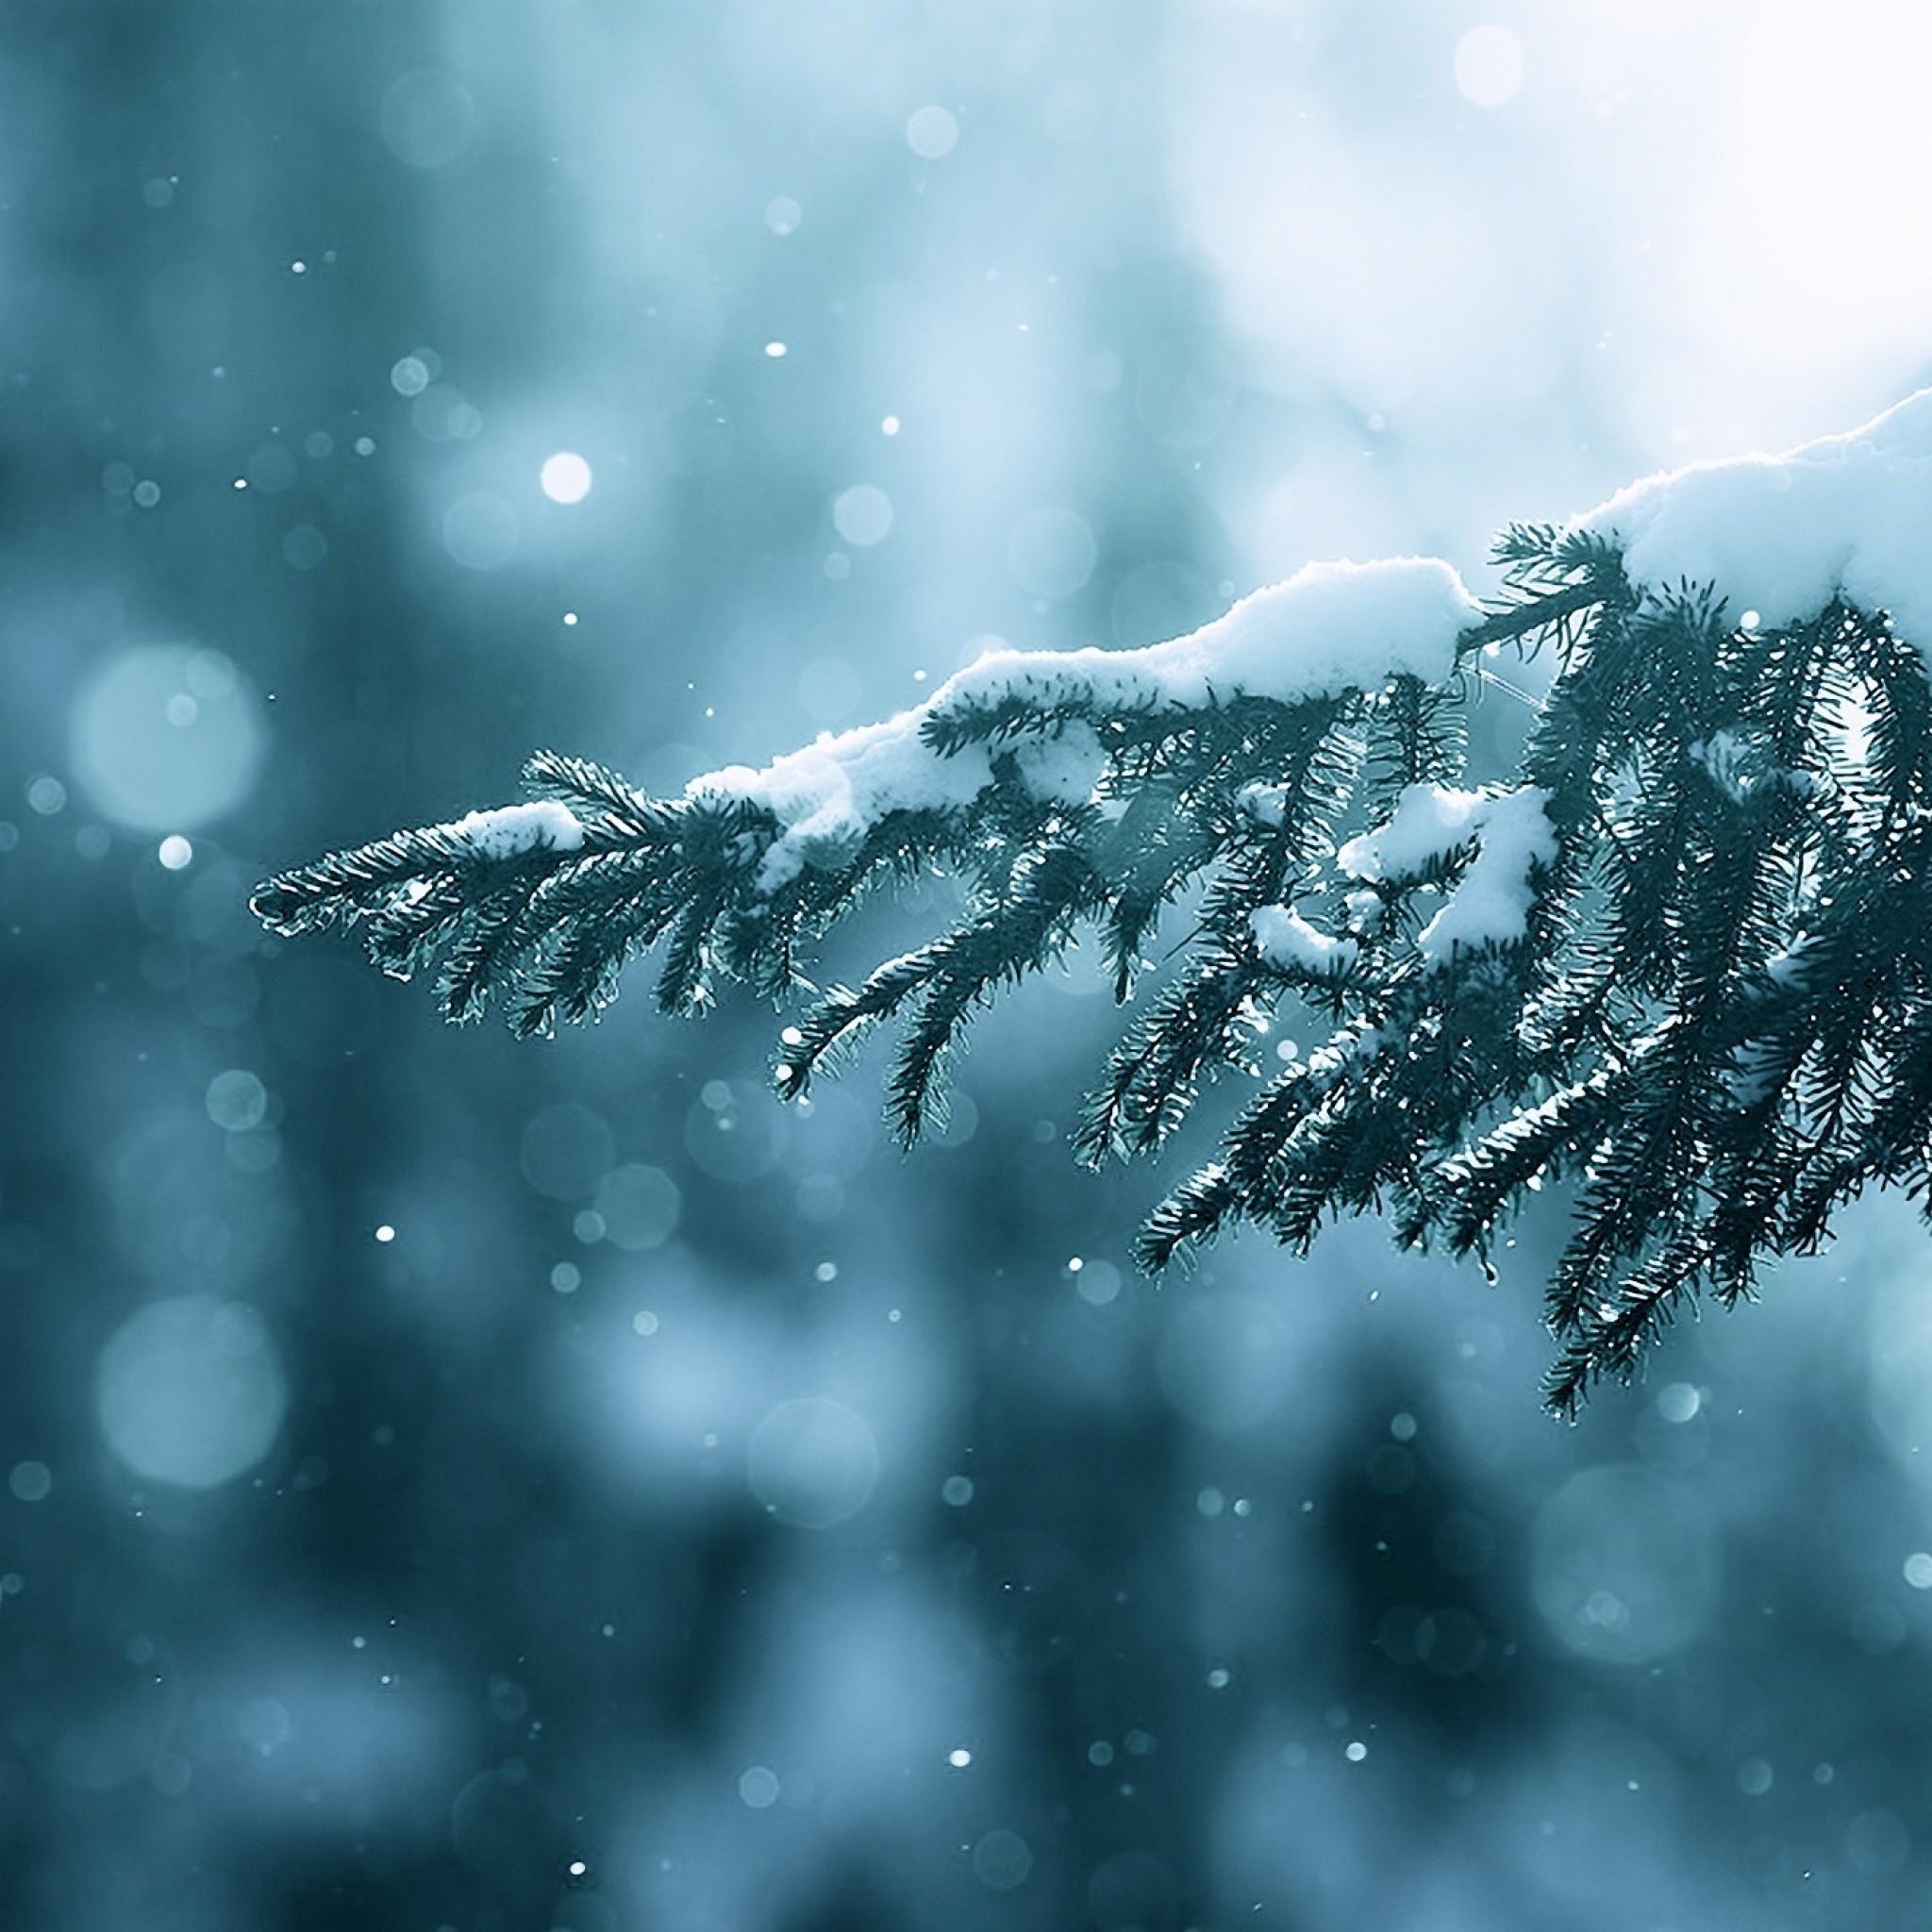 Winter Wallpaper: Winter Wallpaper For IPad